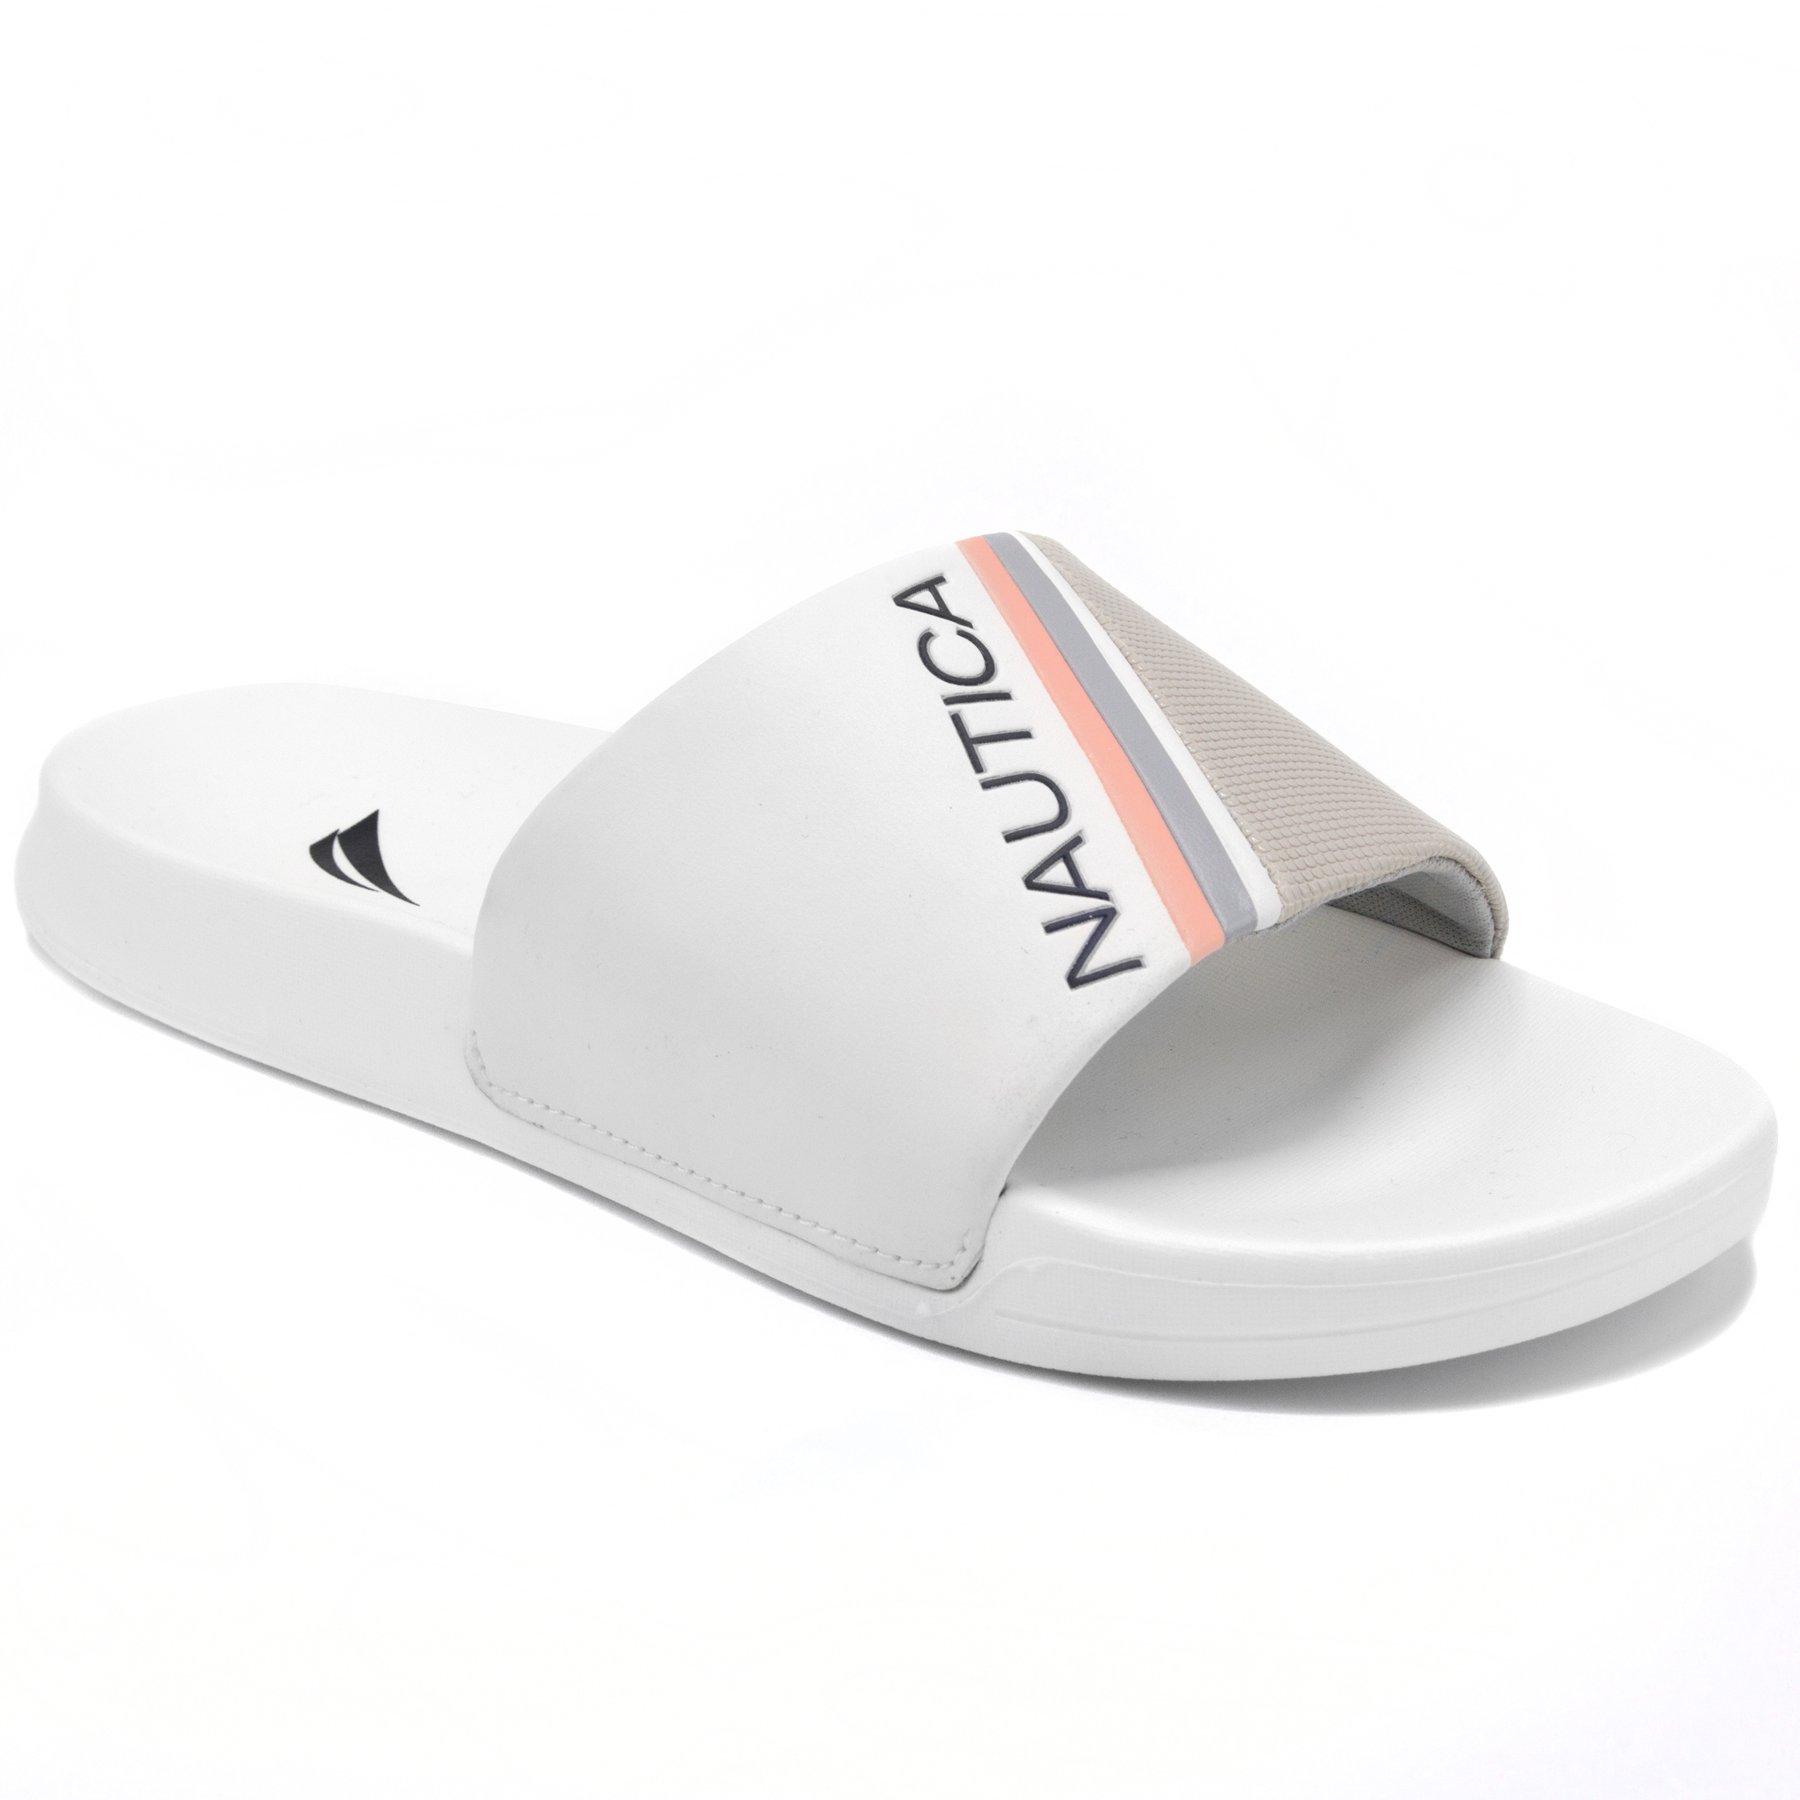 Nautica Women's Athletic Slide, Shower Shoe ,Beach Sandal, Boat Slide NORTON-GREY-6